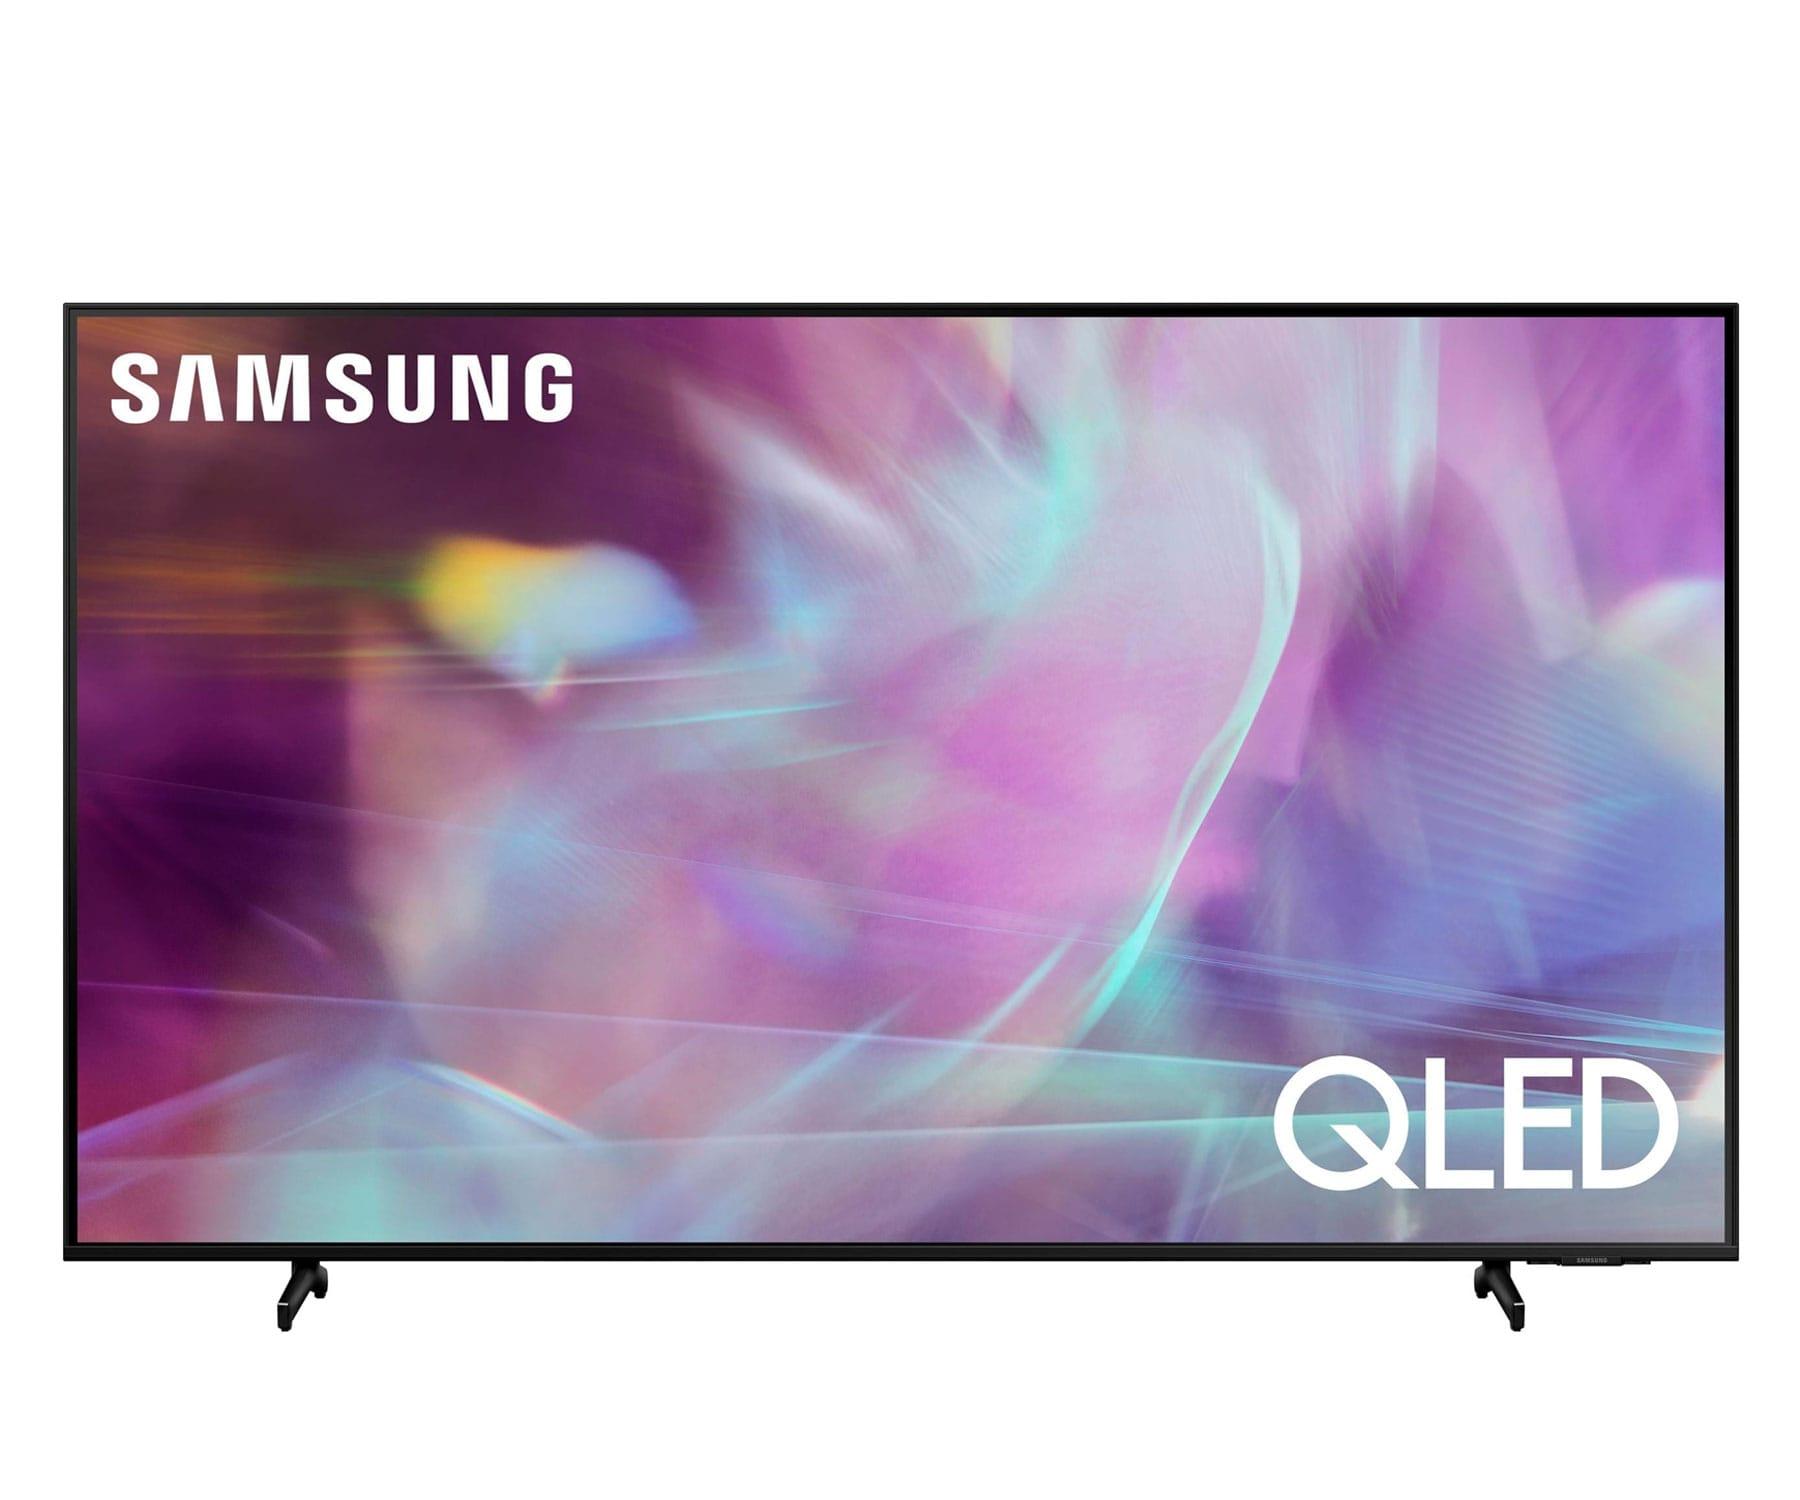 SAMSUNG QE55Q60A TELEVISOR SMART TV 55'' QLED UHD 4K HDR